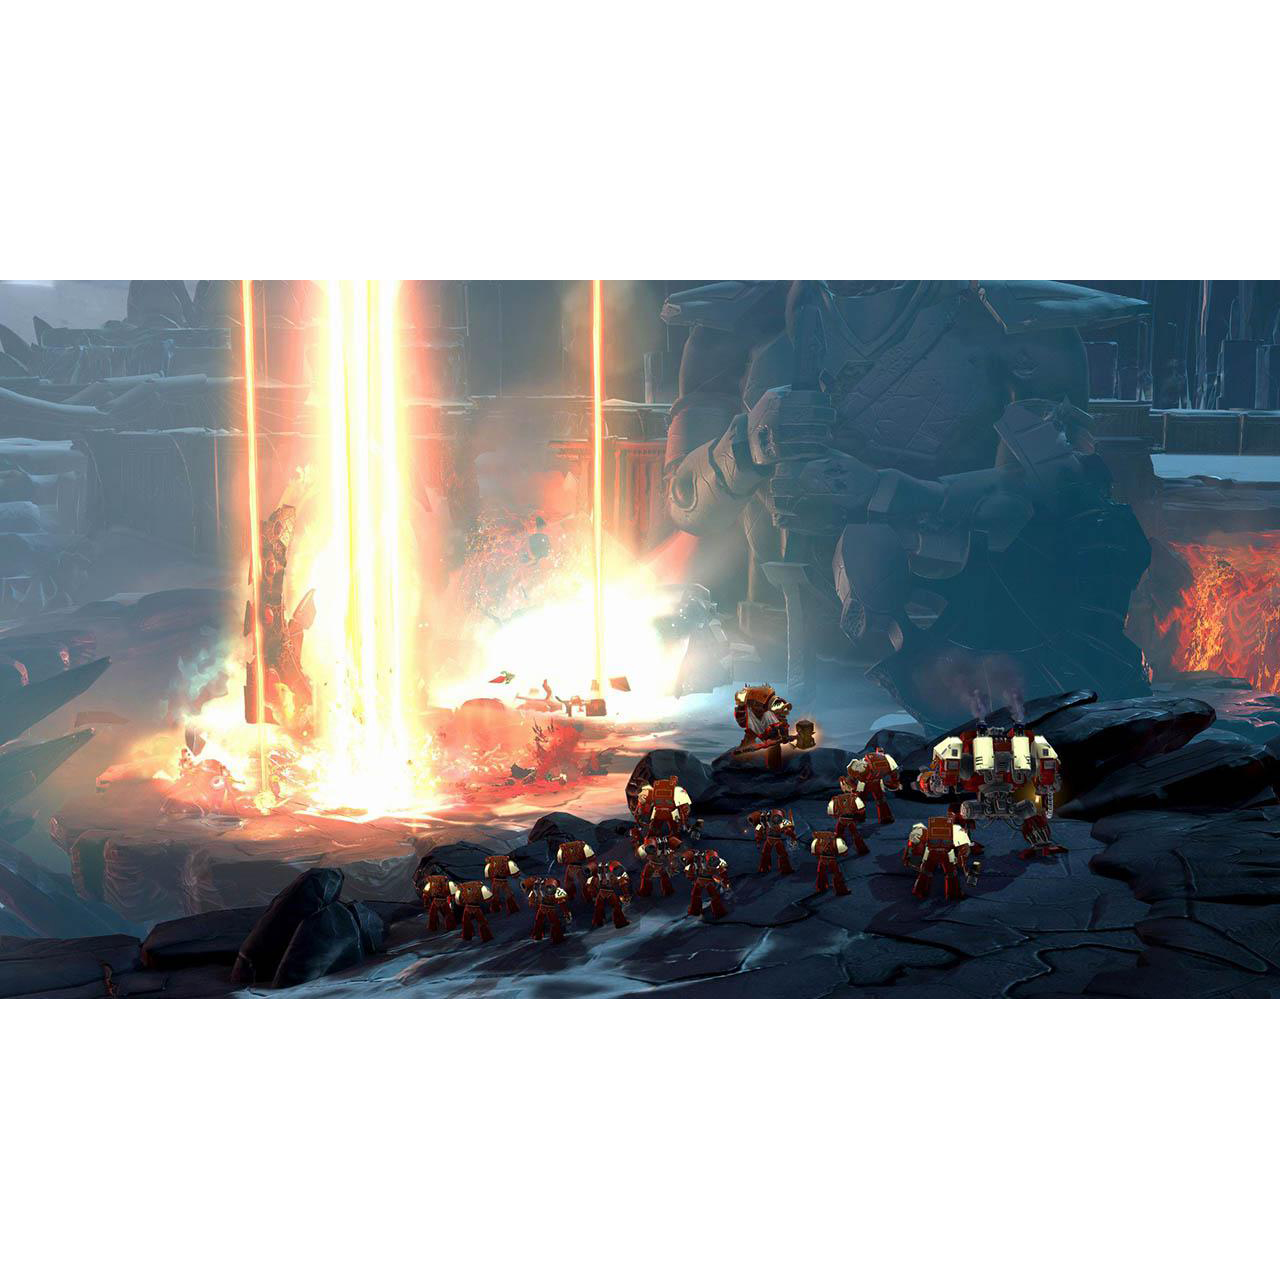 Joc Dawn Of War 3 Limited Edition pentru PC 1